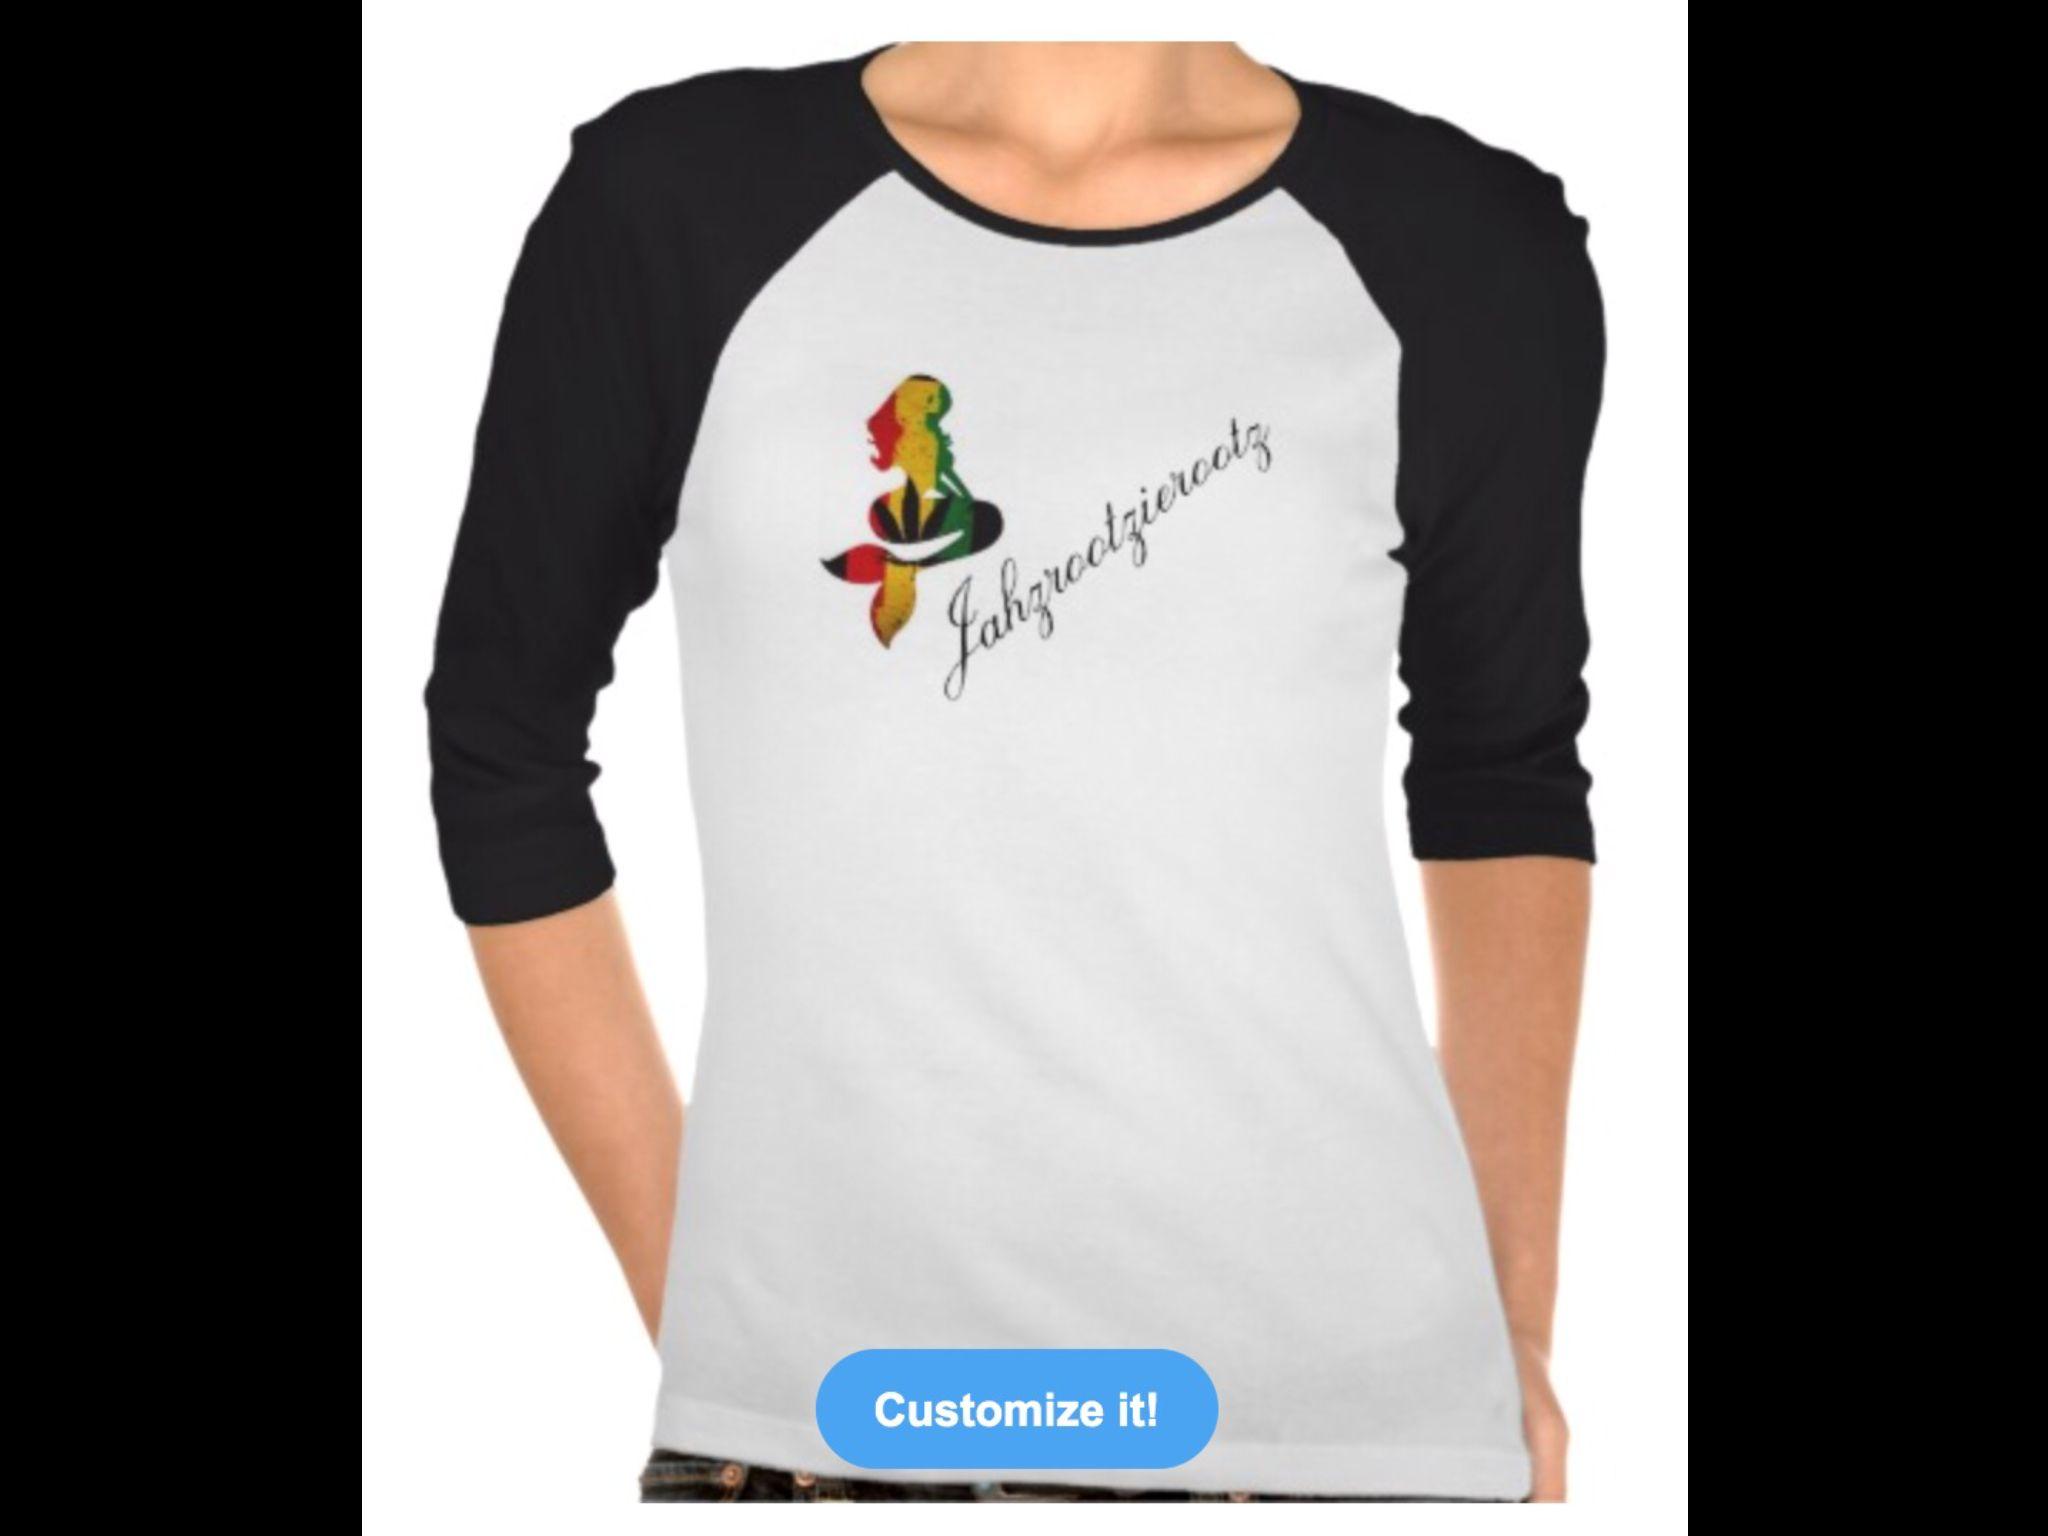 New line of women's 3/4 sleeve Jahzrootzierootz designs! Go checkout the new merchandise. Http://www.zazzle.com/Jahzrootzierootz*/